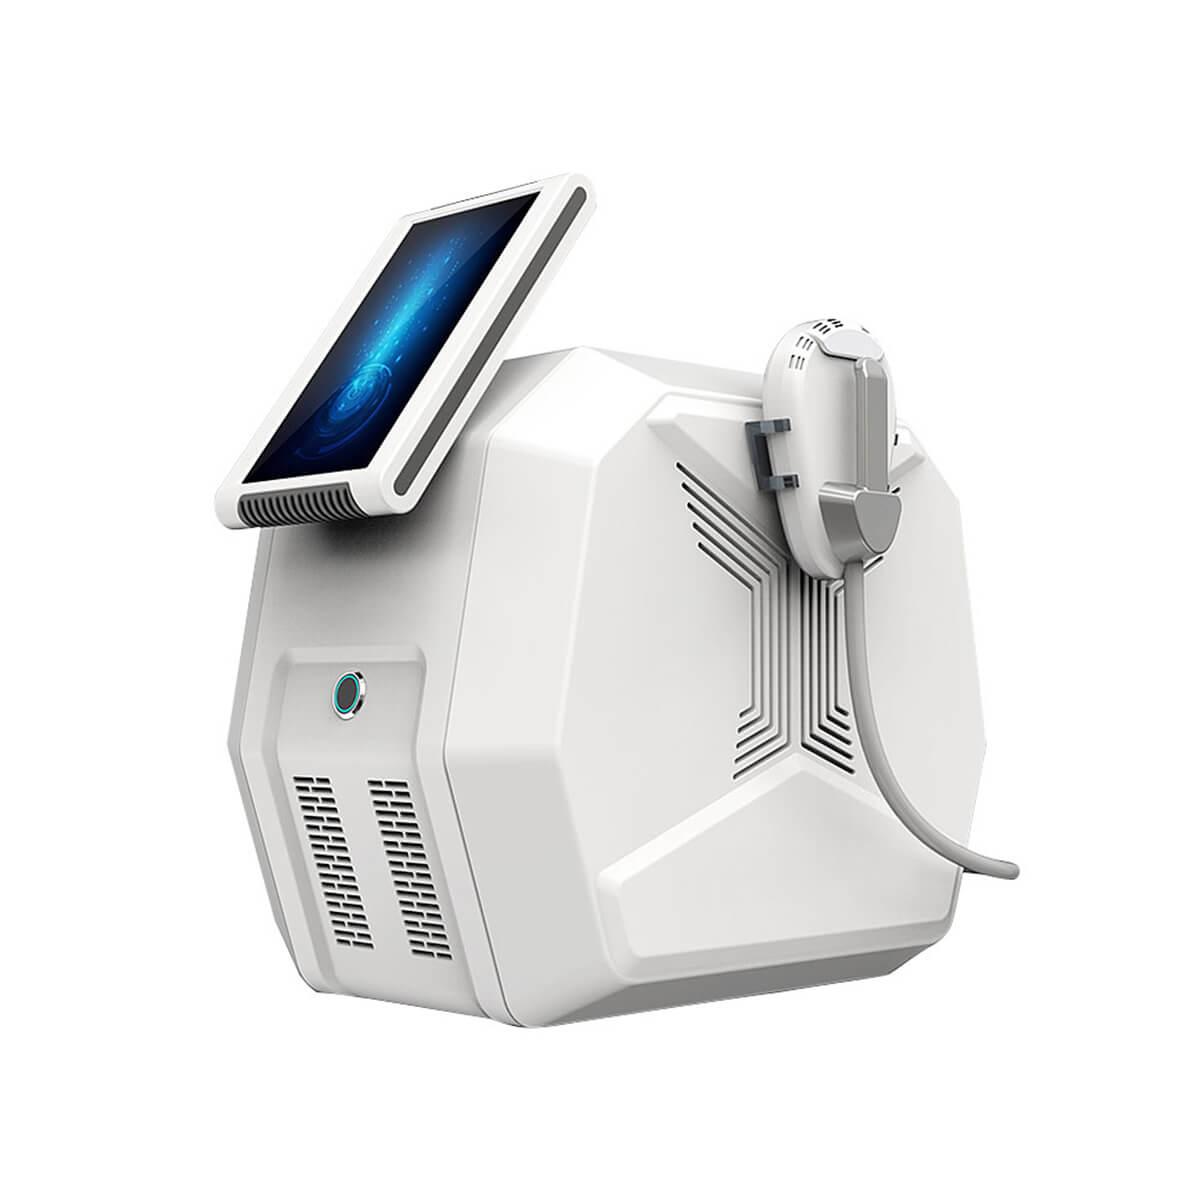 ems stimulation machine 6